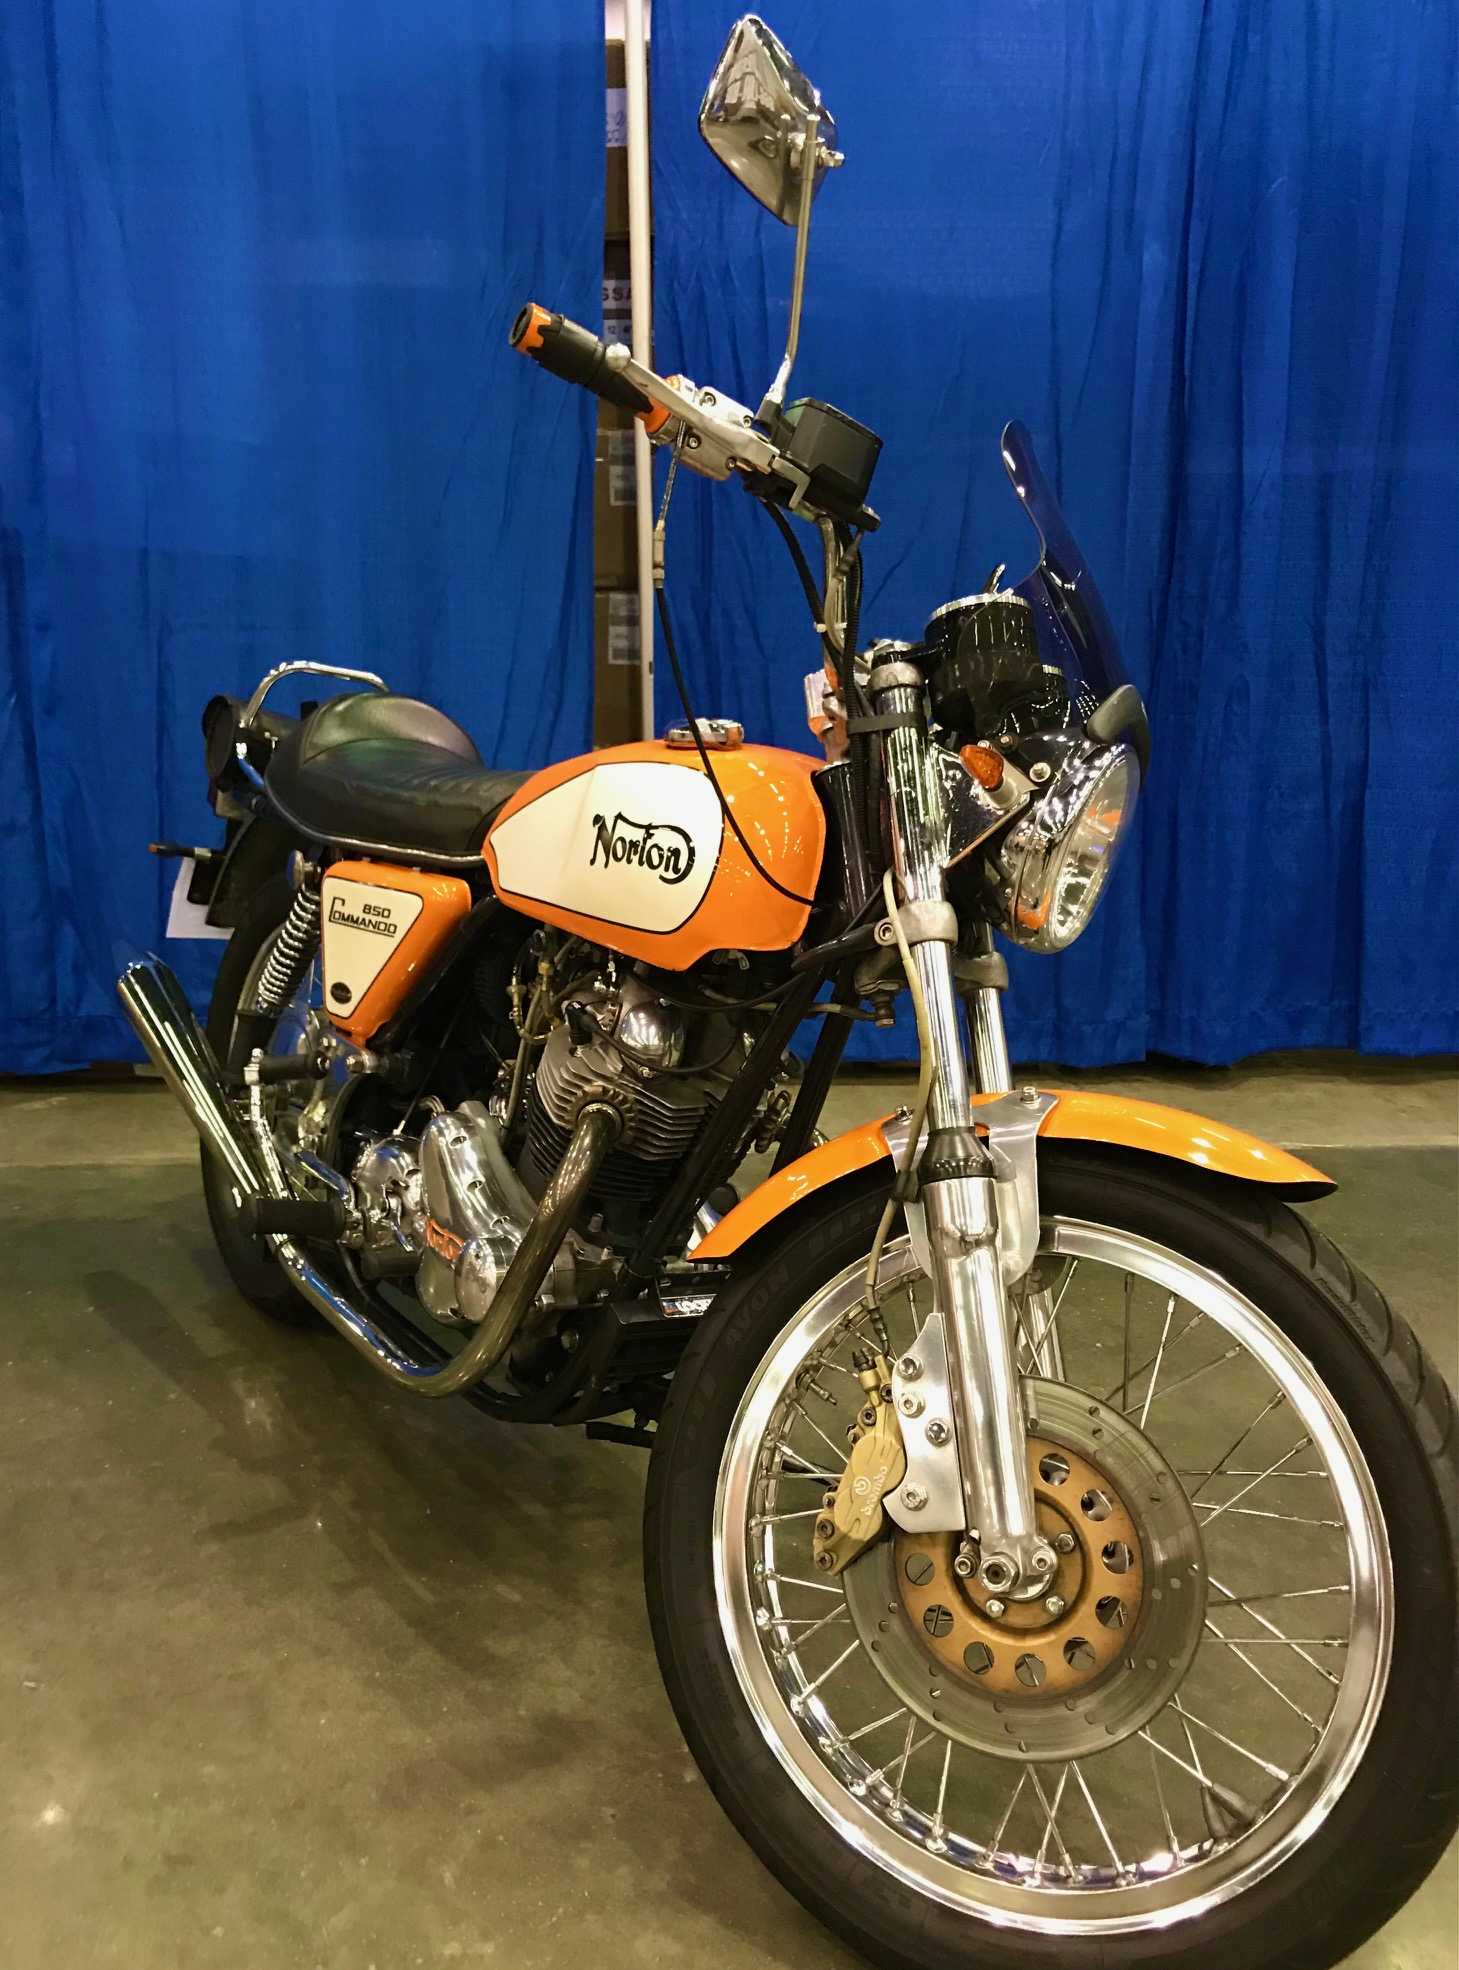 MotorcycleShow_39